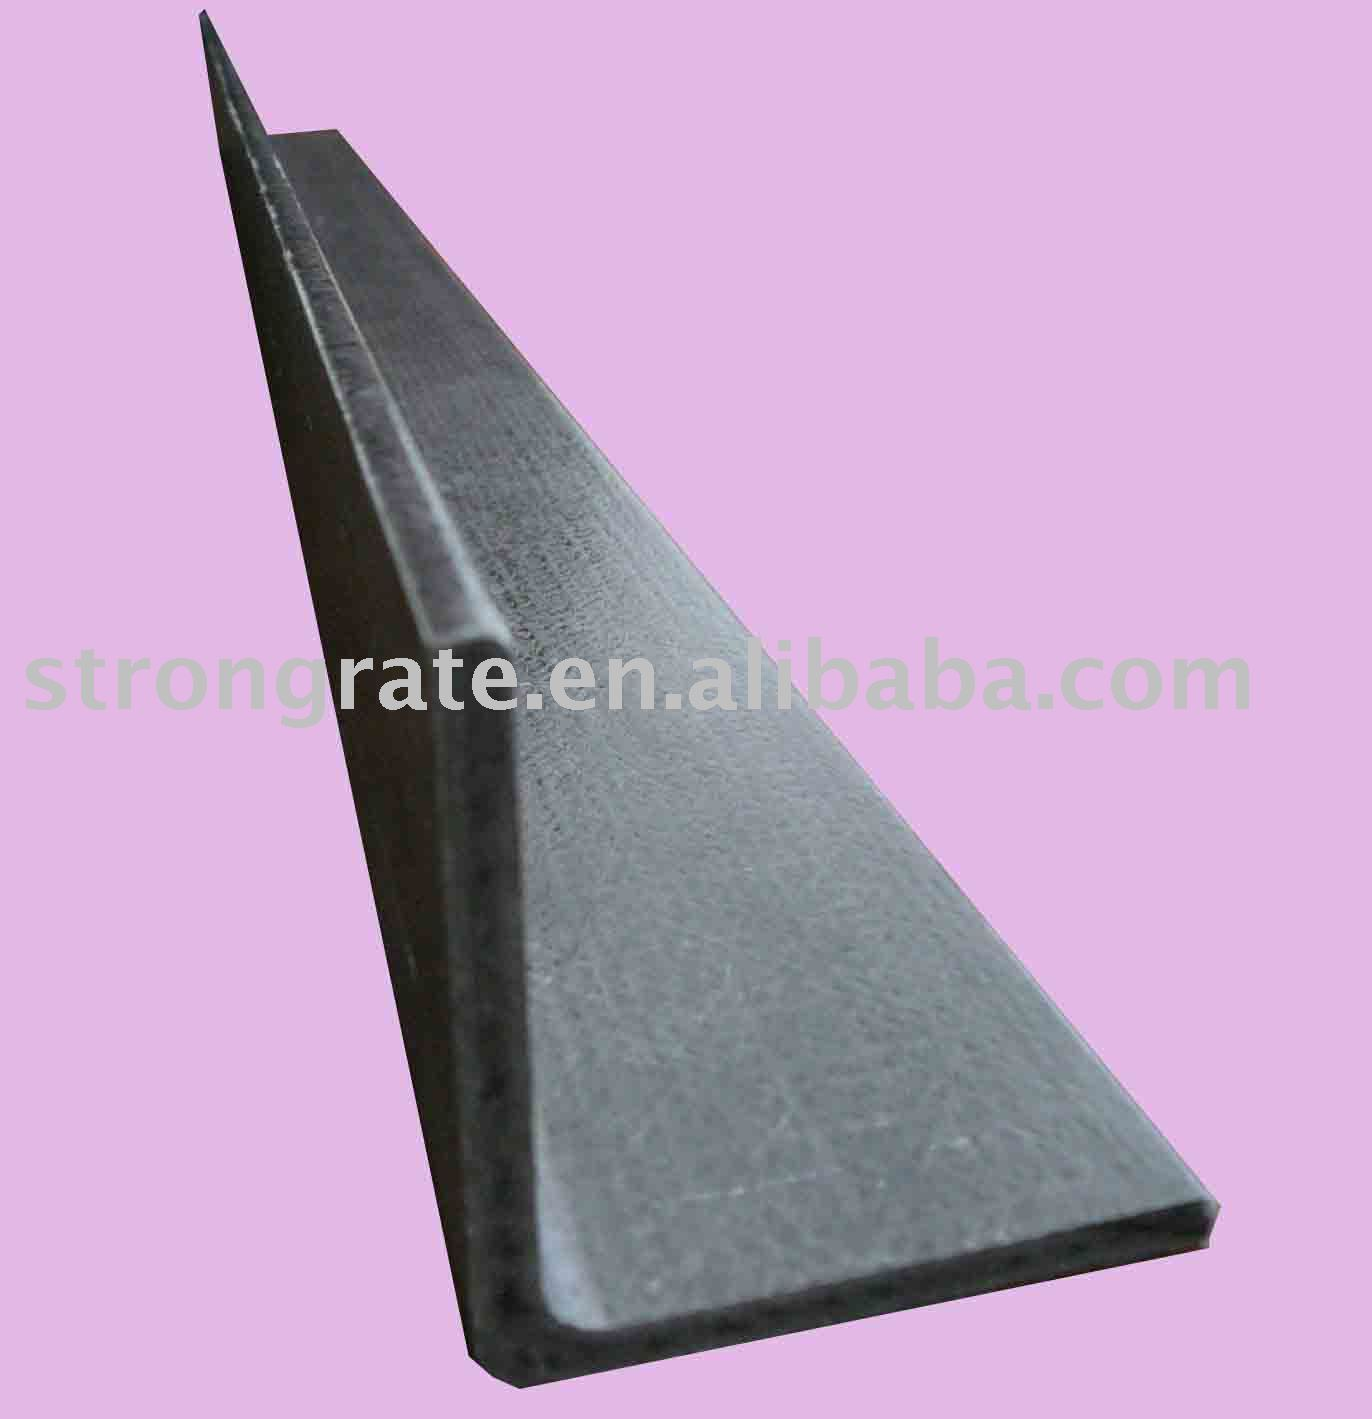 Frp Angle,Frp Profile,Plastic